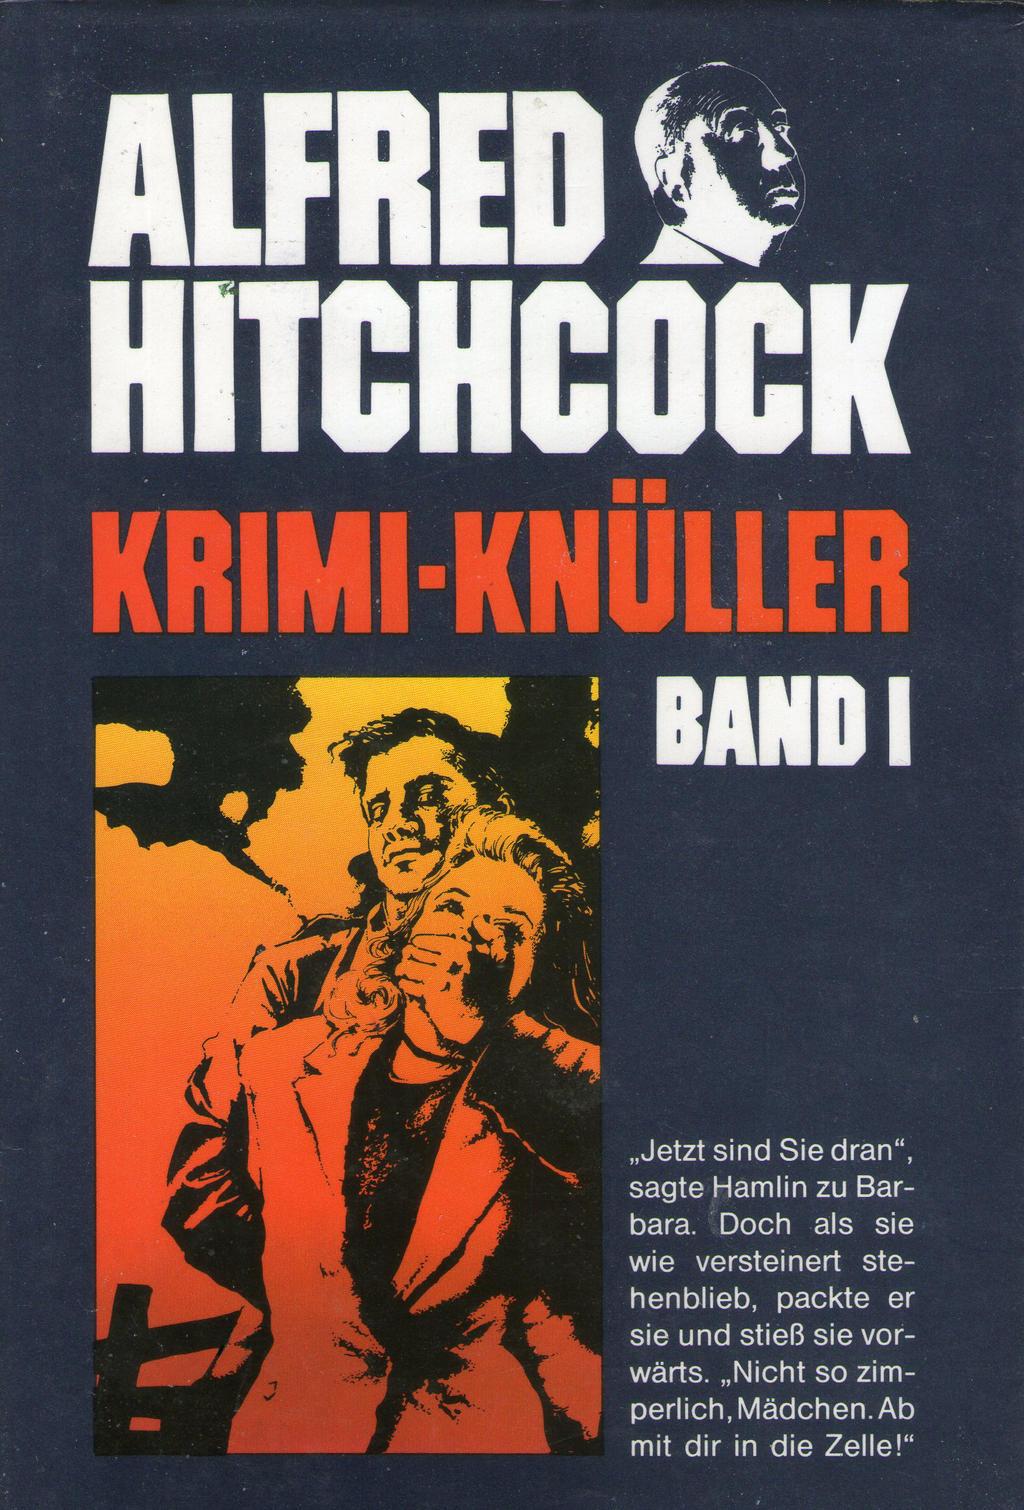 Herr Hitchcock by trichyda